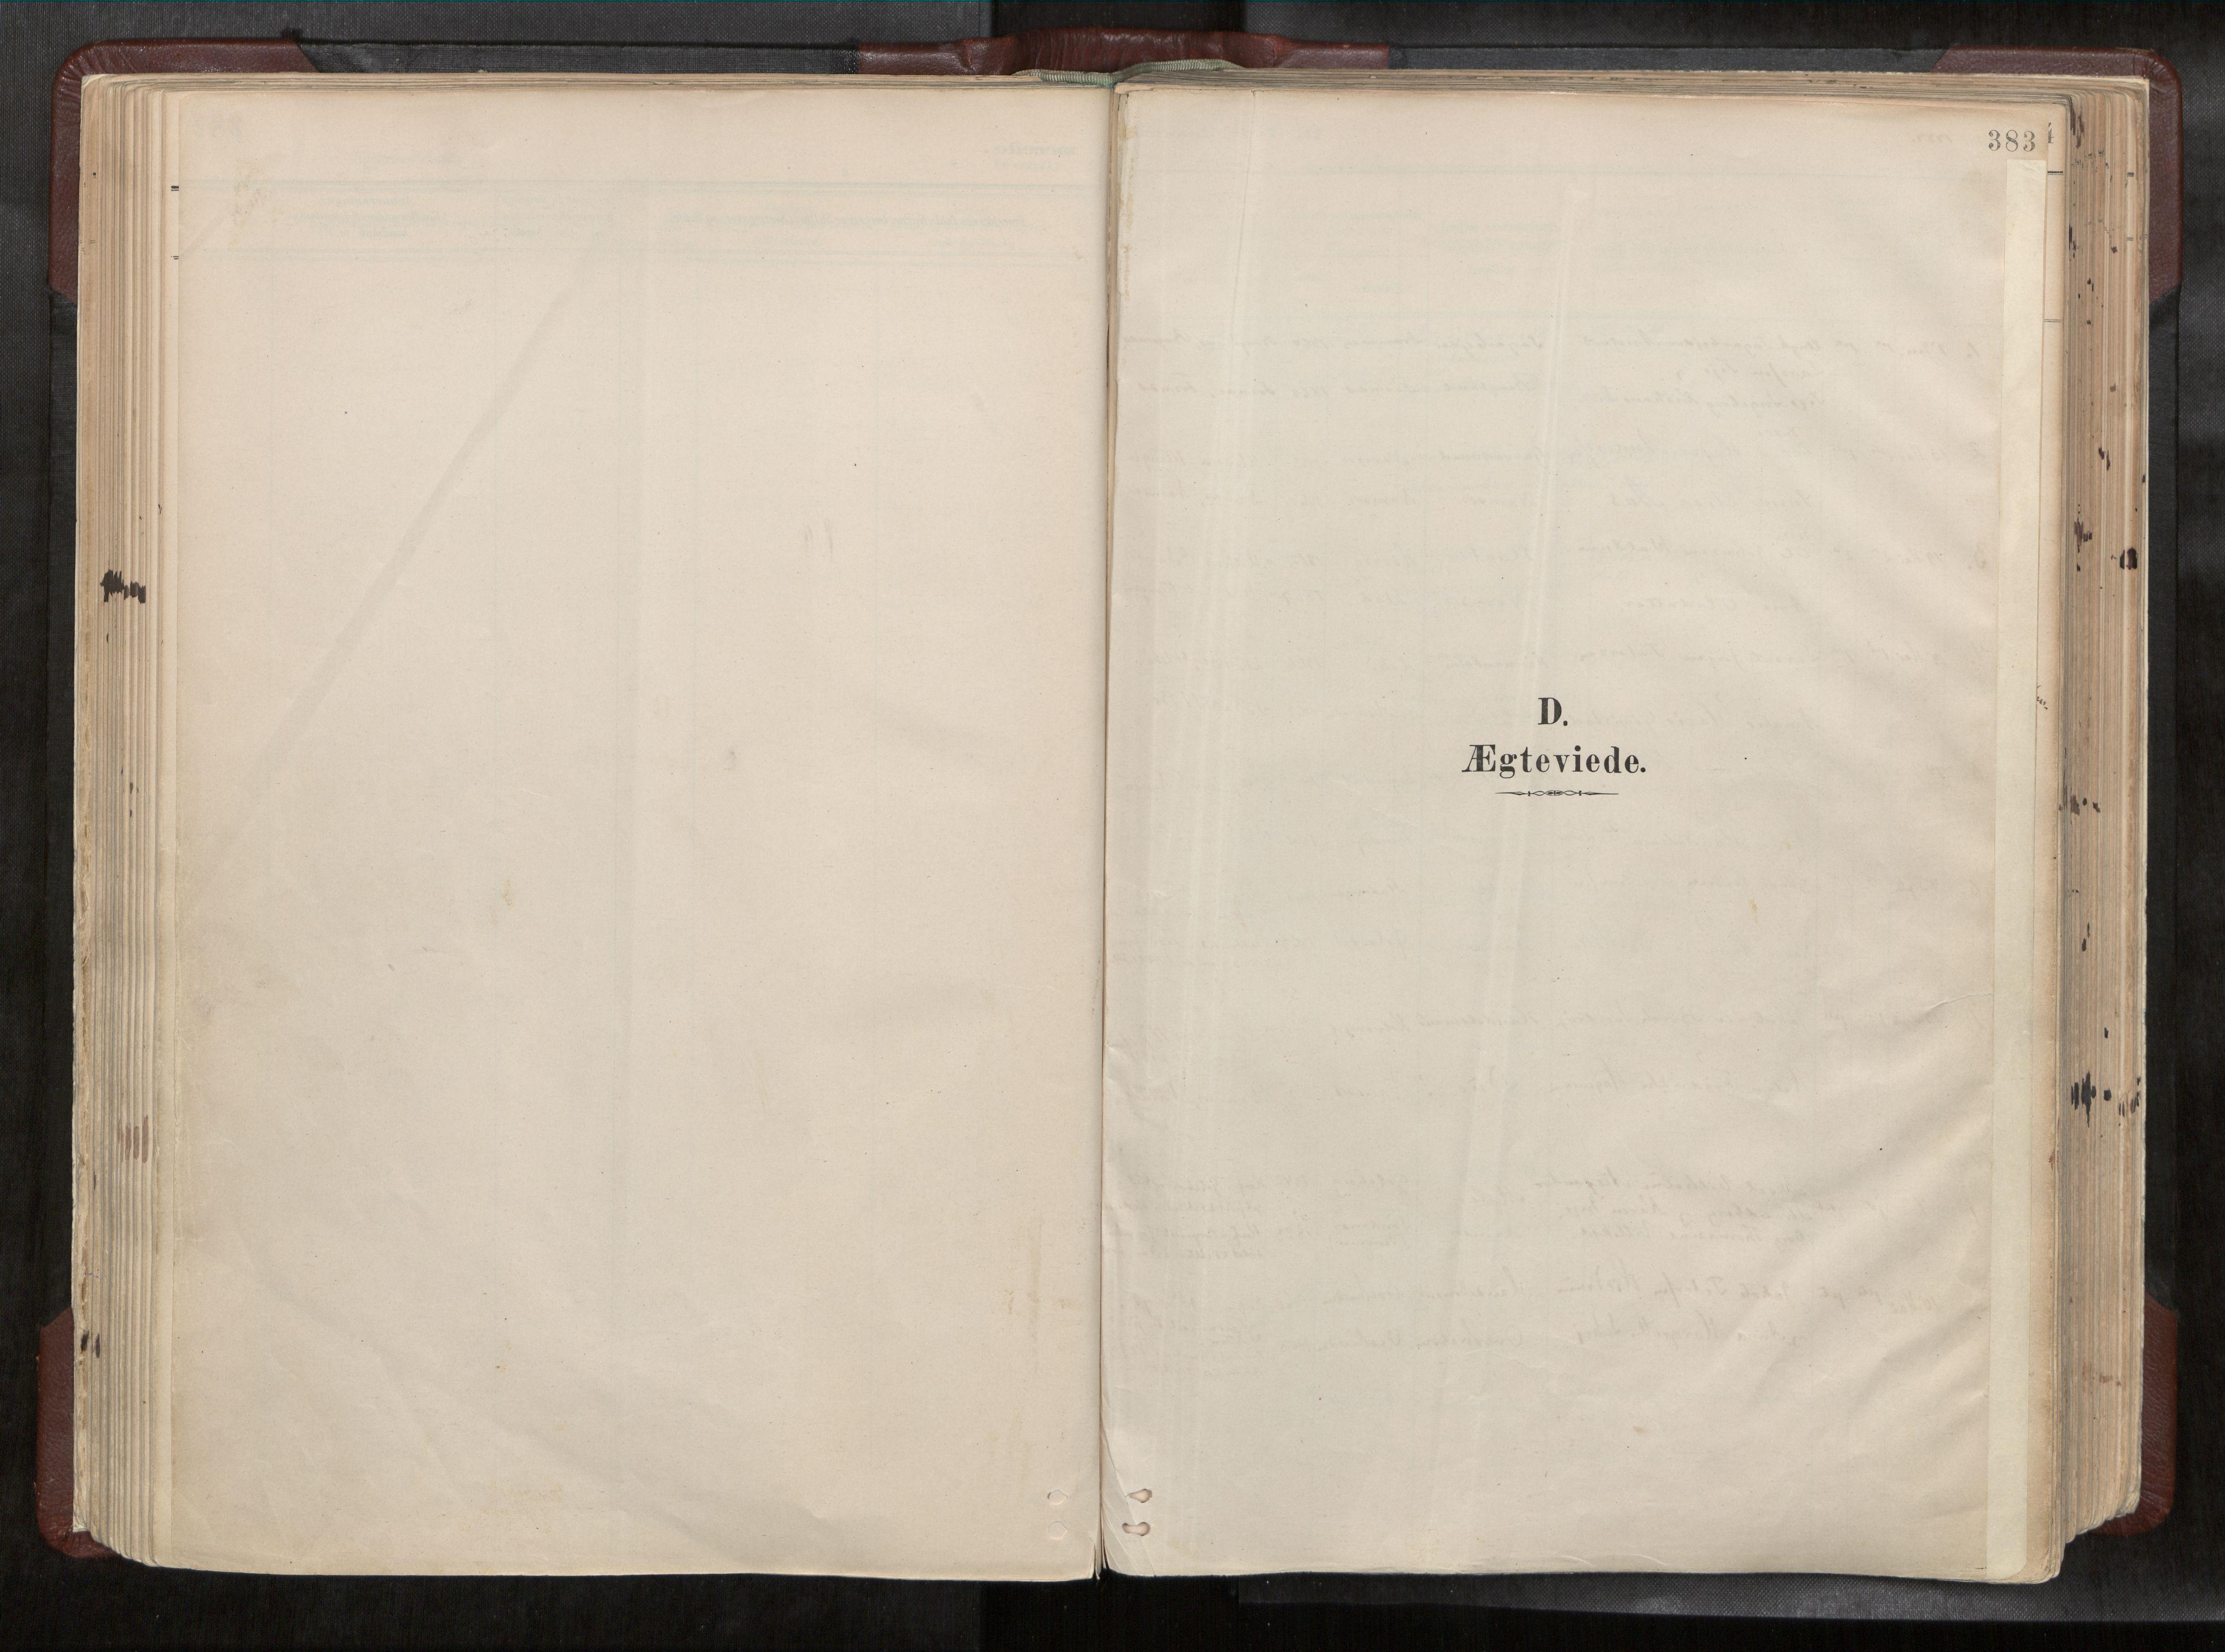 SAT, Ministerialprotokoller, klokkerbøker og fødselsregistre - Nord-Trøndelag, 768/L0579a: Ministerialbok nr. 768A14, 1887-1931, s. 383